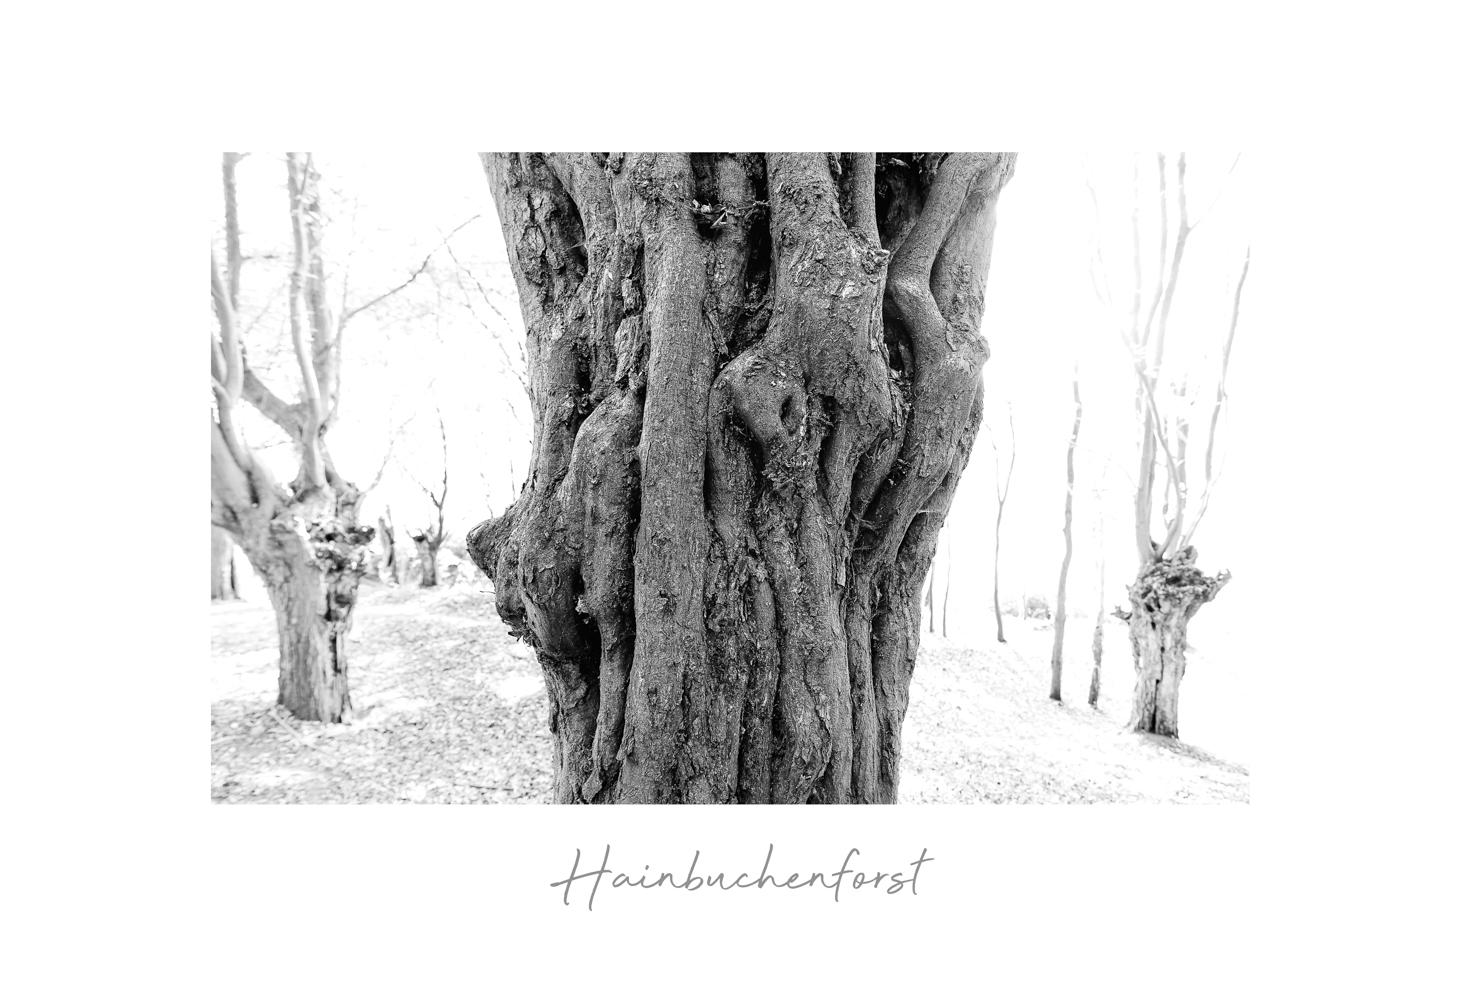 hainbuchenhorst-2